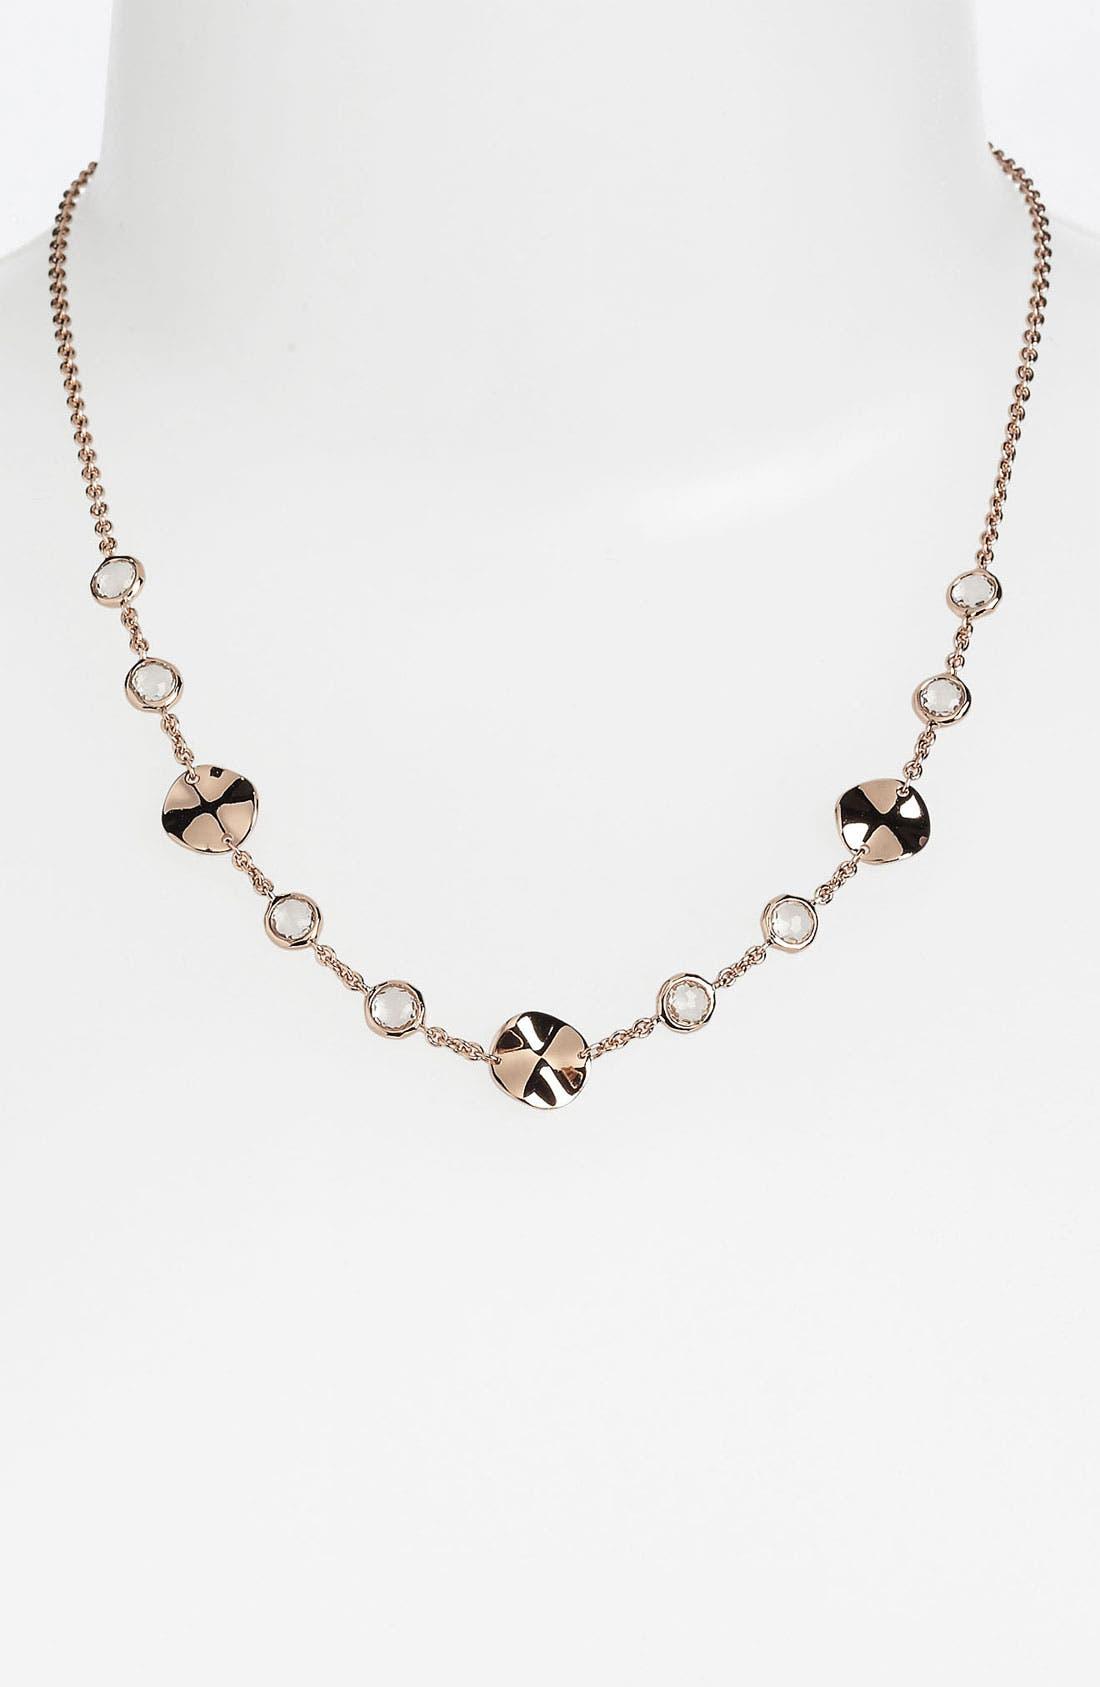 Alternate Image 1 Selected - Ippolita 'Lite Links' Stone & Wavy Disc Station Necklace